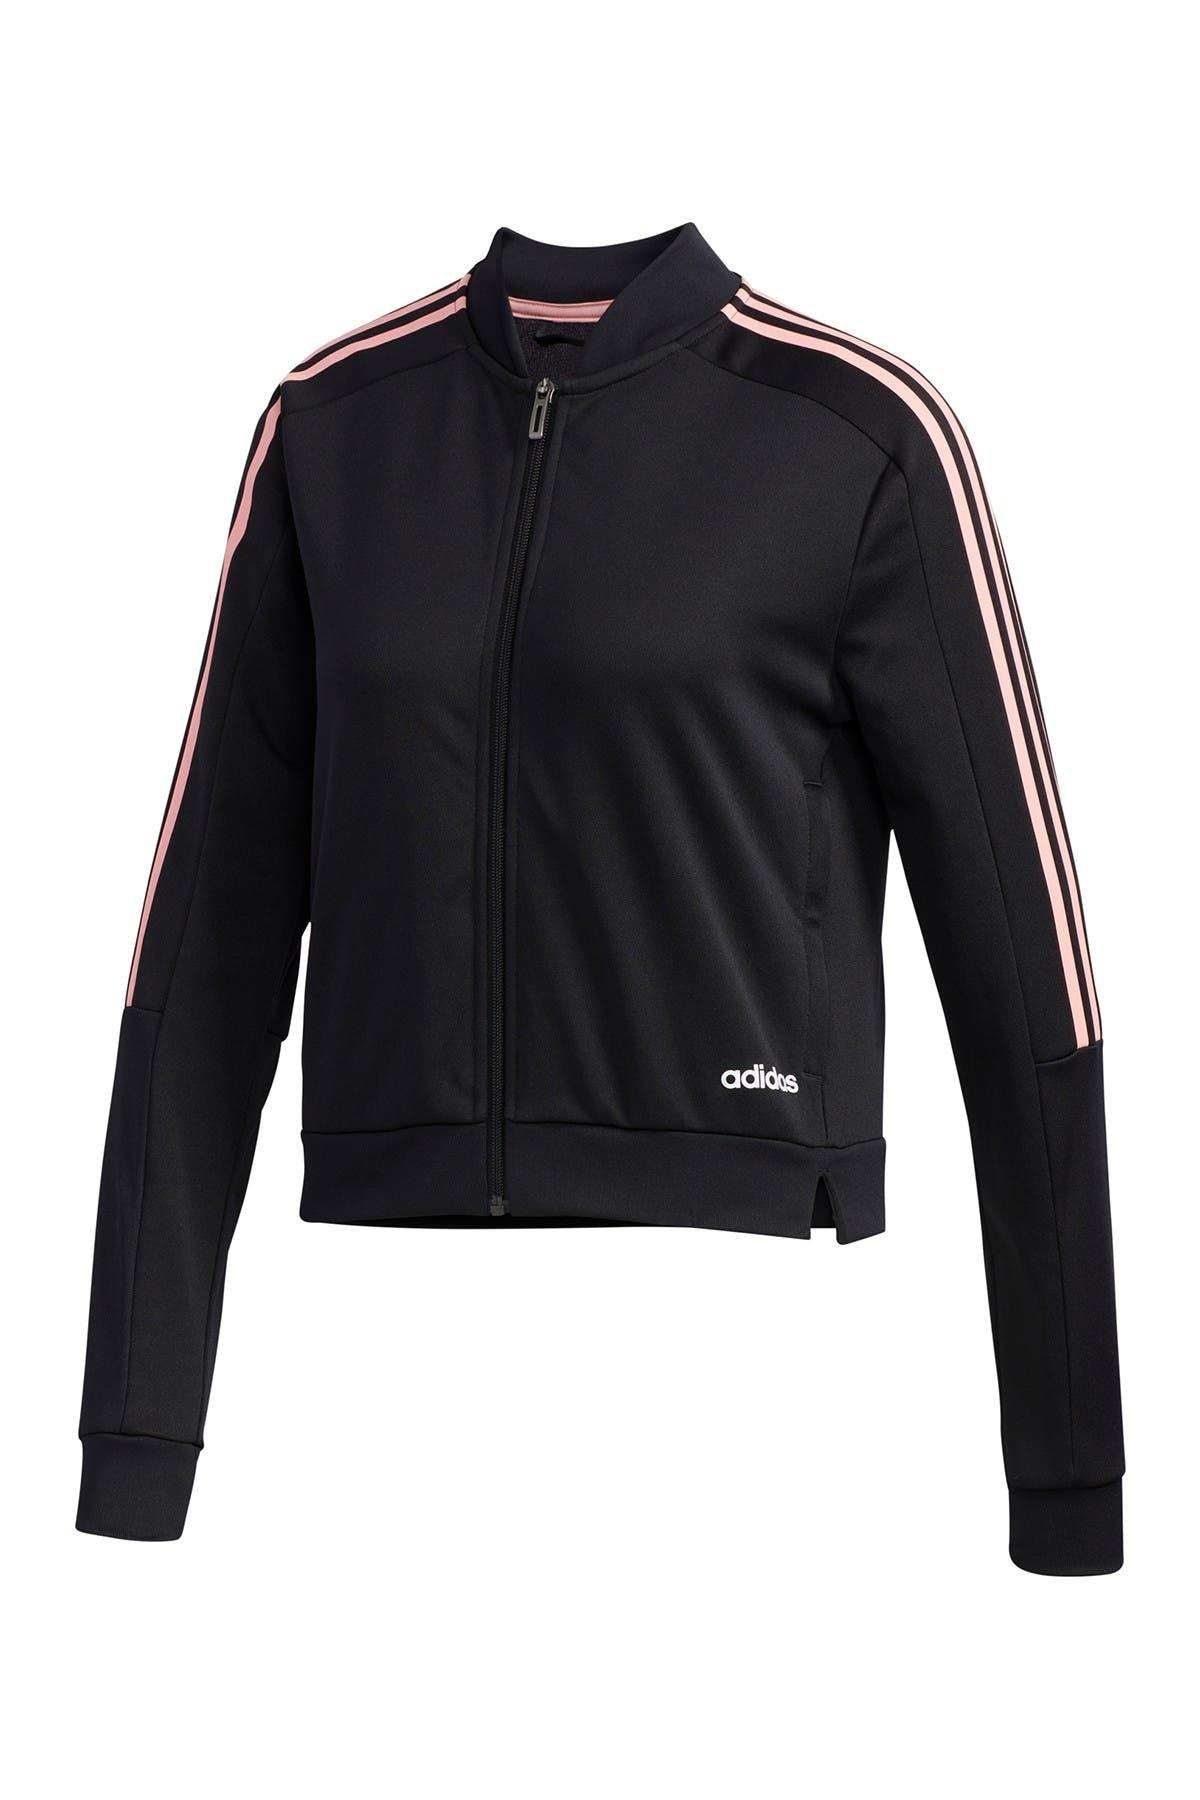 Image of adidas Climalite 3-Stripes Zip Track Jacket